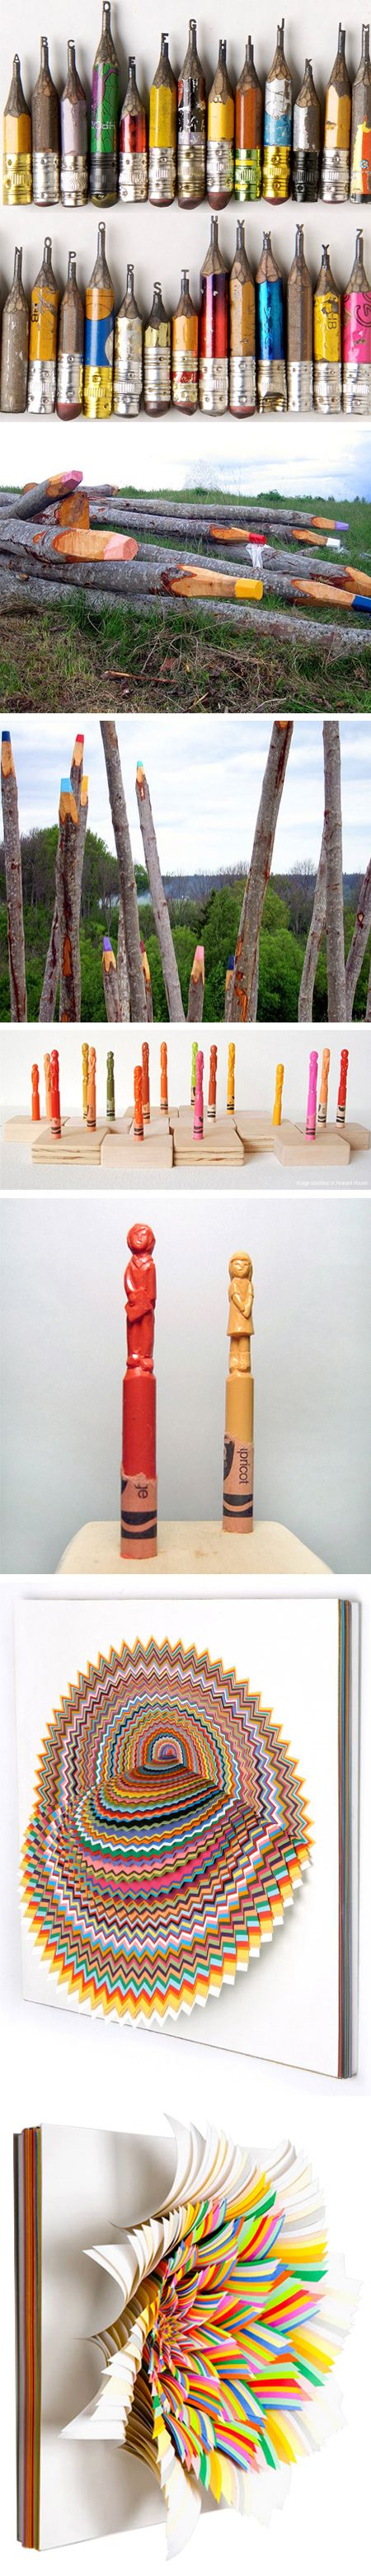 Dalton Ghetti (alphabet carved pencils), Jonna Pohjalainen (log pencil crayon installation), Diem Chau (carved crayons), and Jennifer Stark (cut-paper sculptures)